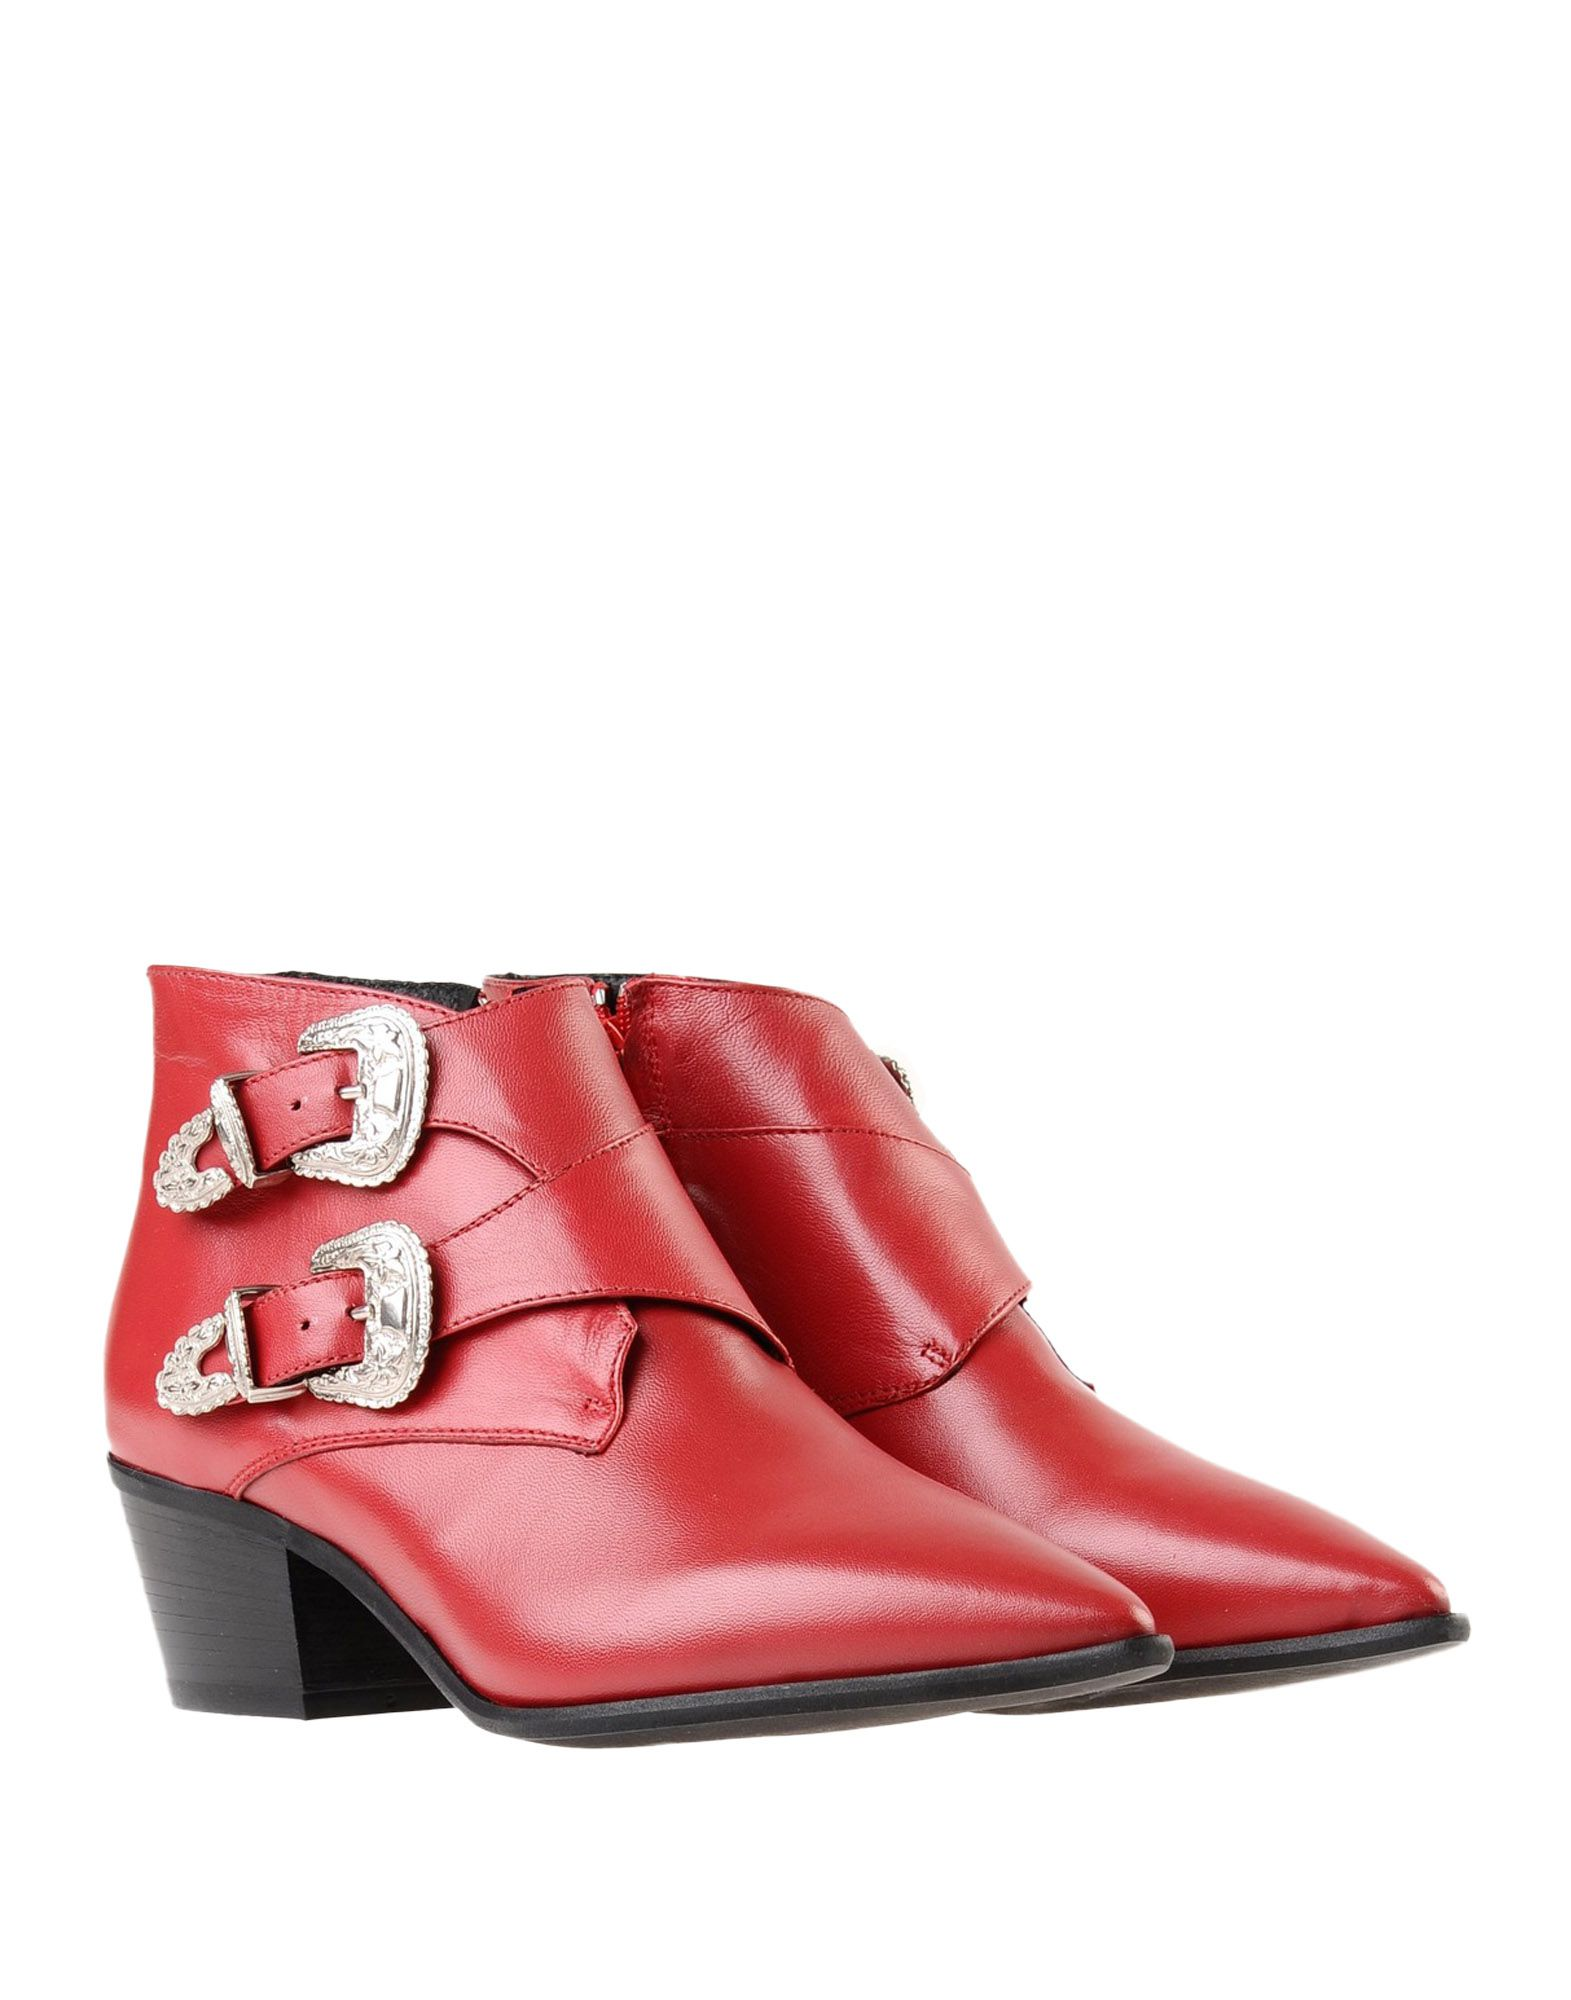 Gut um billige Schuhe Schuhe billige zu tragenGeorge J. Love Stiefelette Damen  11545062OE 1329a8